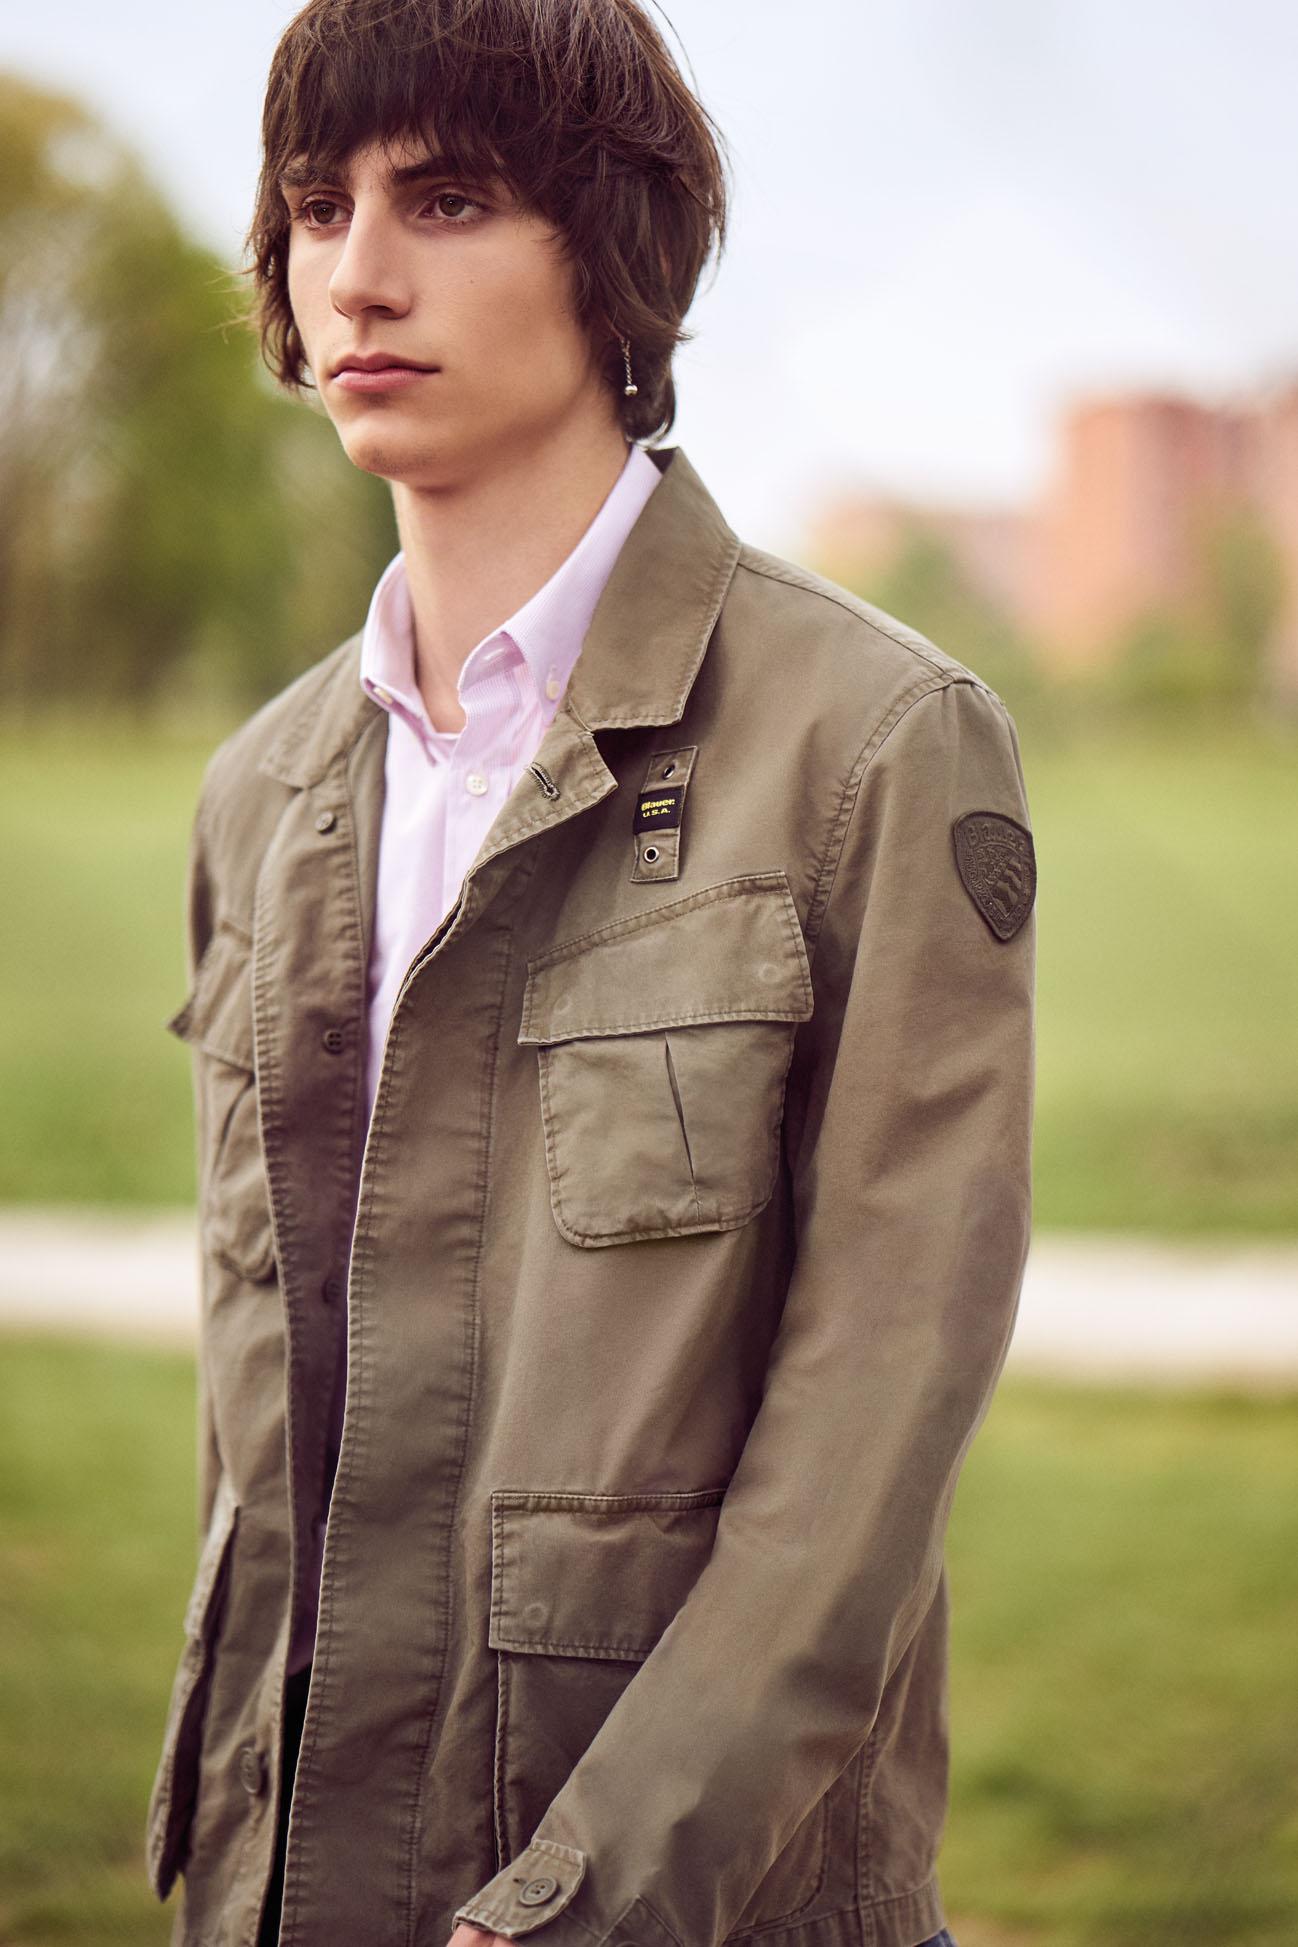 "GQ Italy May-June 2017 ""Field Jacket"" | Tim Clark | GQ Italia | Andrea Tenerani | Numerique Retouch Photo Retouching Studio"